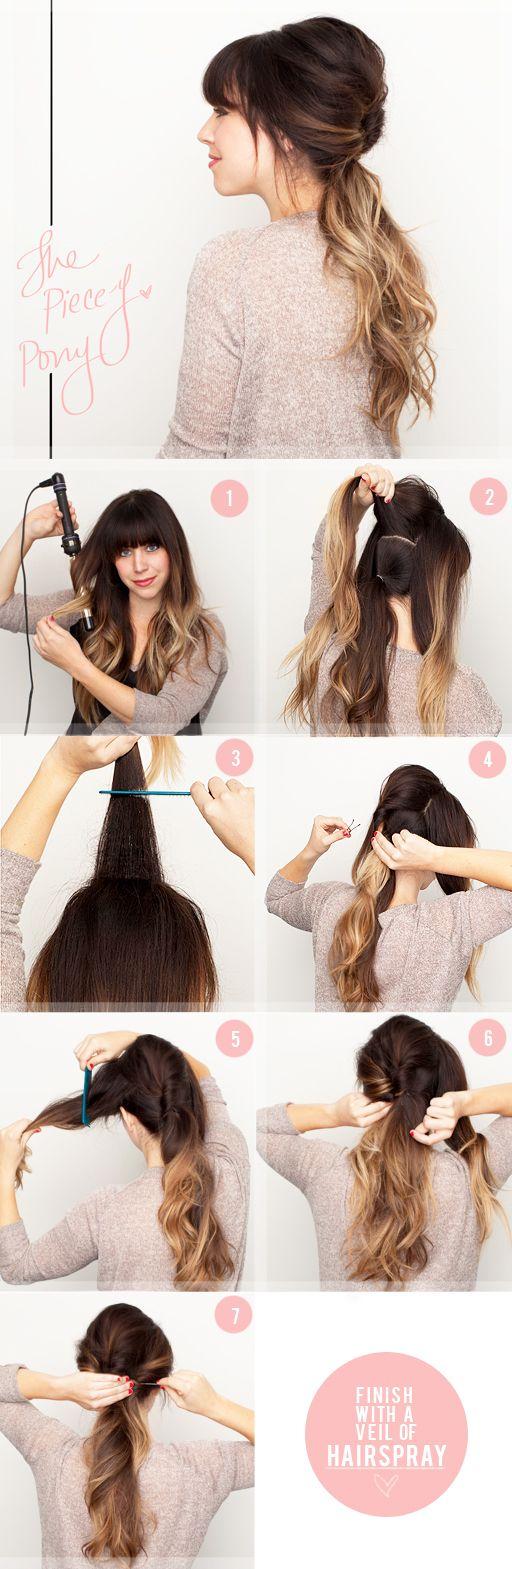 Incredible 5 Diy Hairstyles Perfect For Pre Wedding Parties Short Hairstyles Gunalazisus